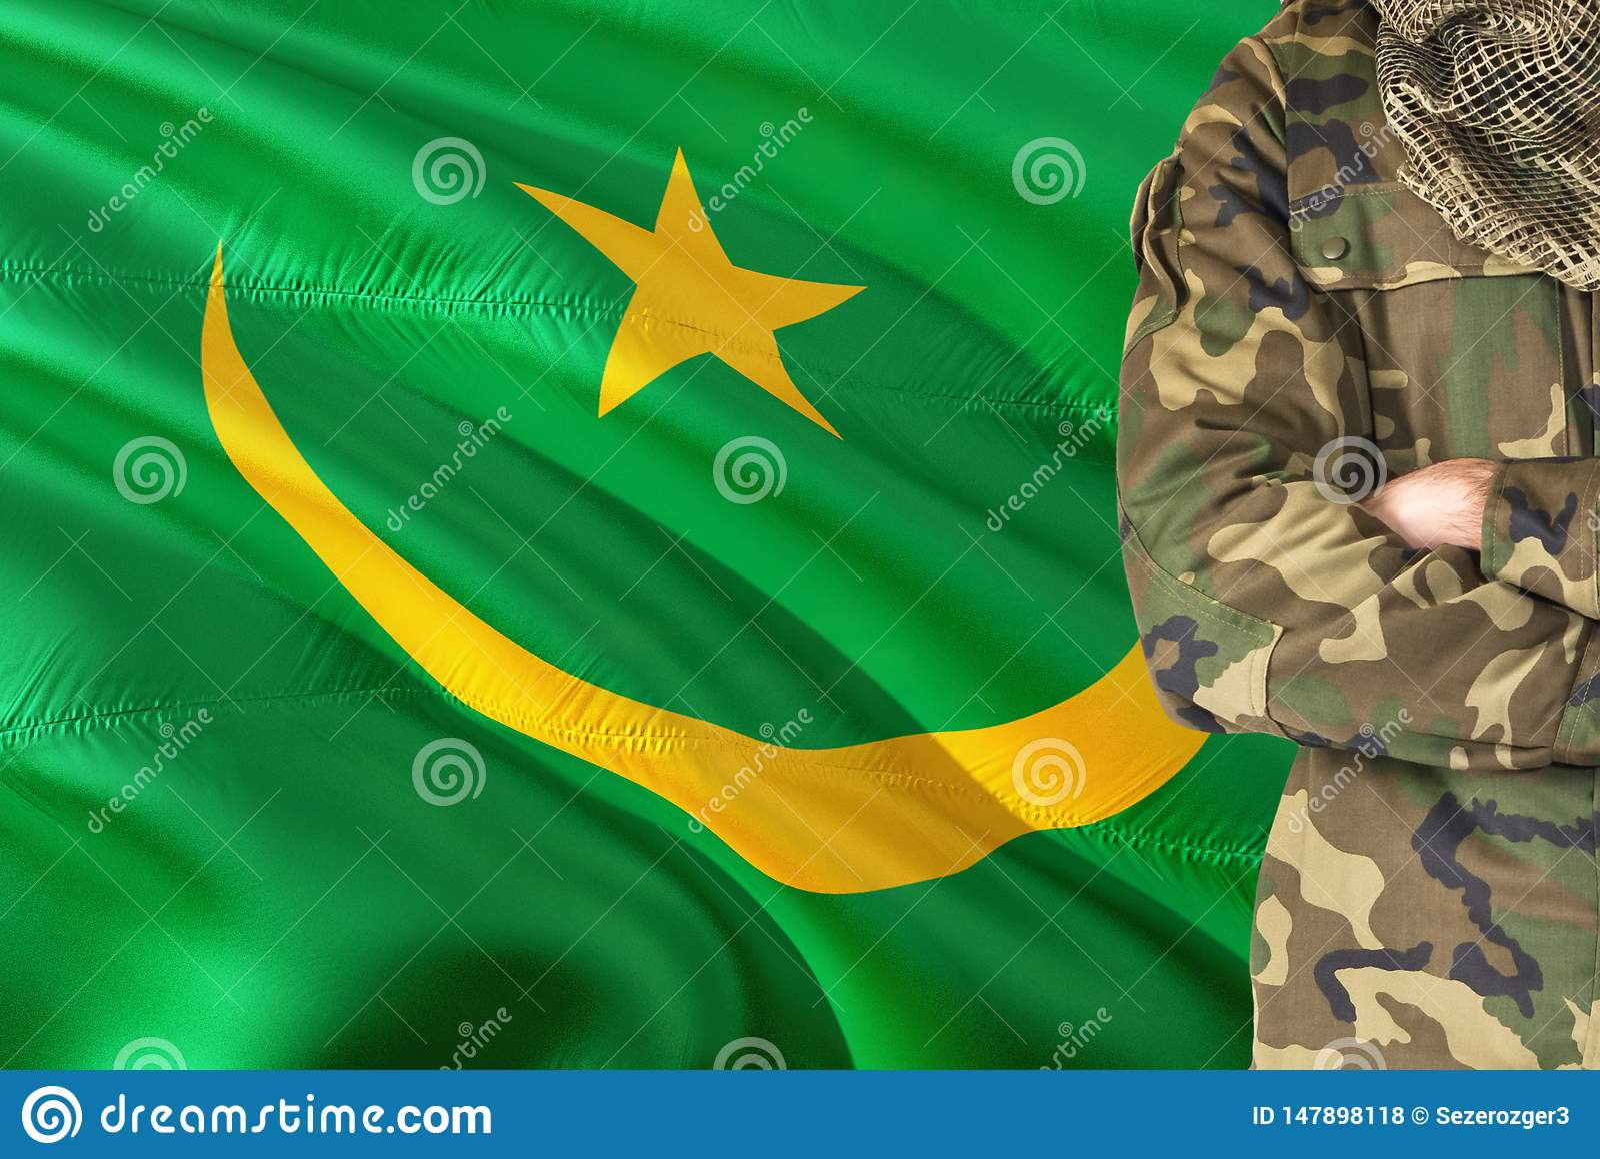 Gekruiste wapens Mauritaanse militair met nationale golvende vlag op achtergrond - het Militaire thema van Mauretanië